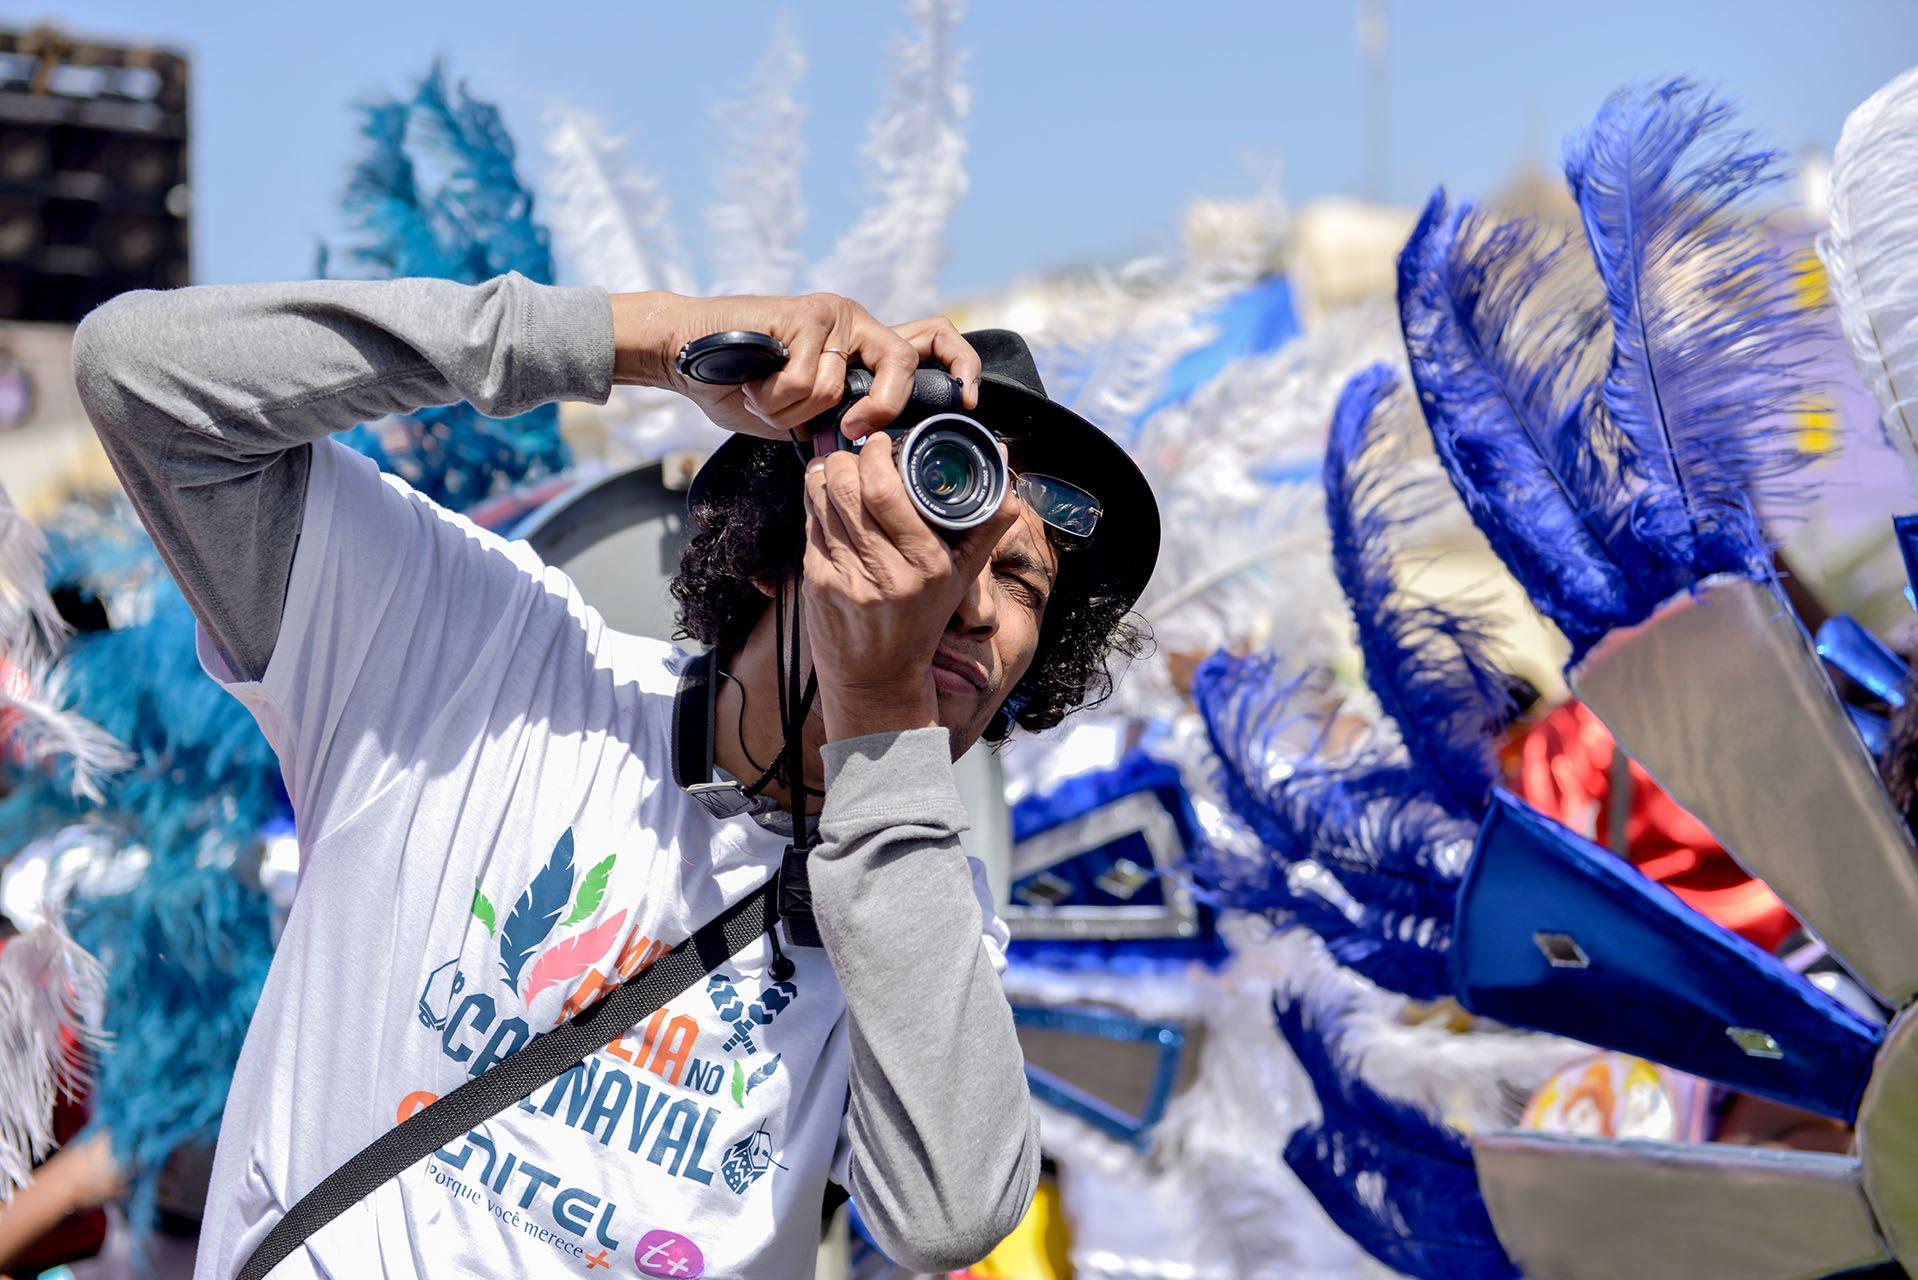 photographe-maya-angelsen-evenementiel-voyage-ile-de-france-cap-vert